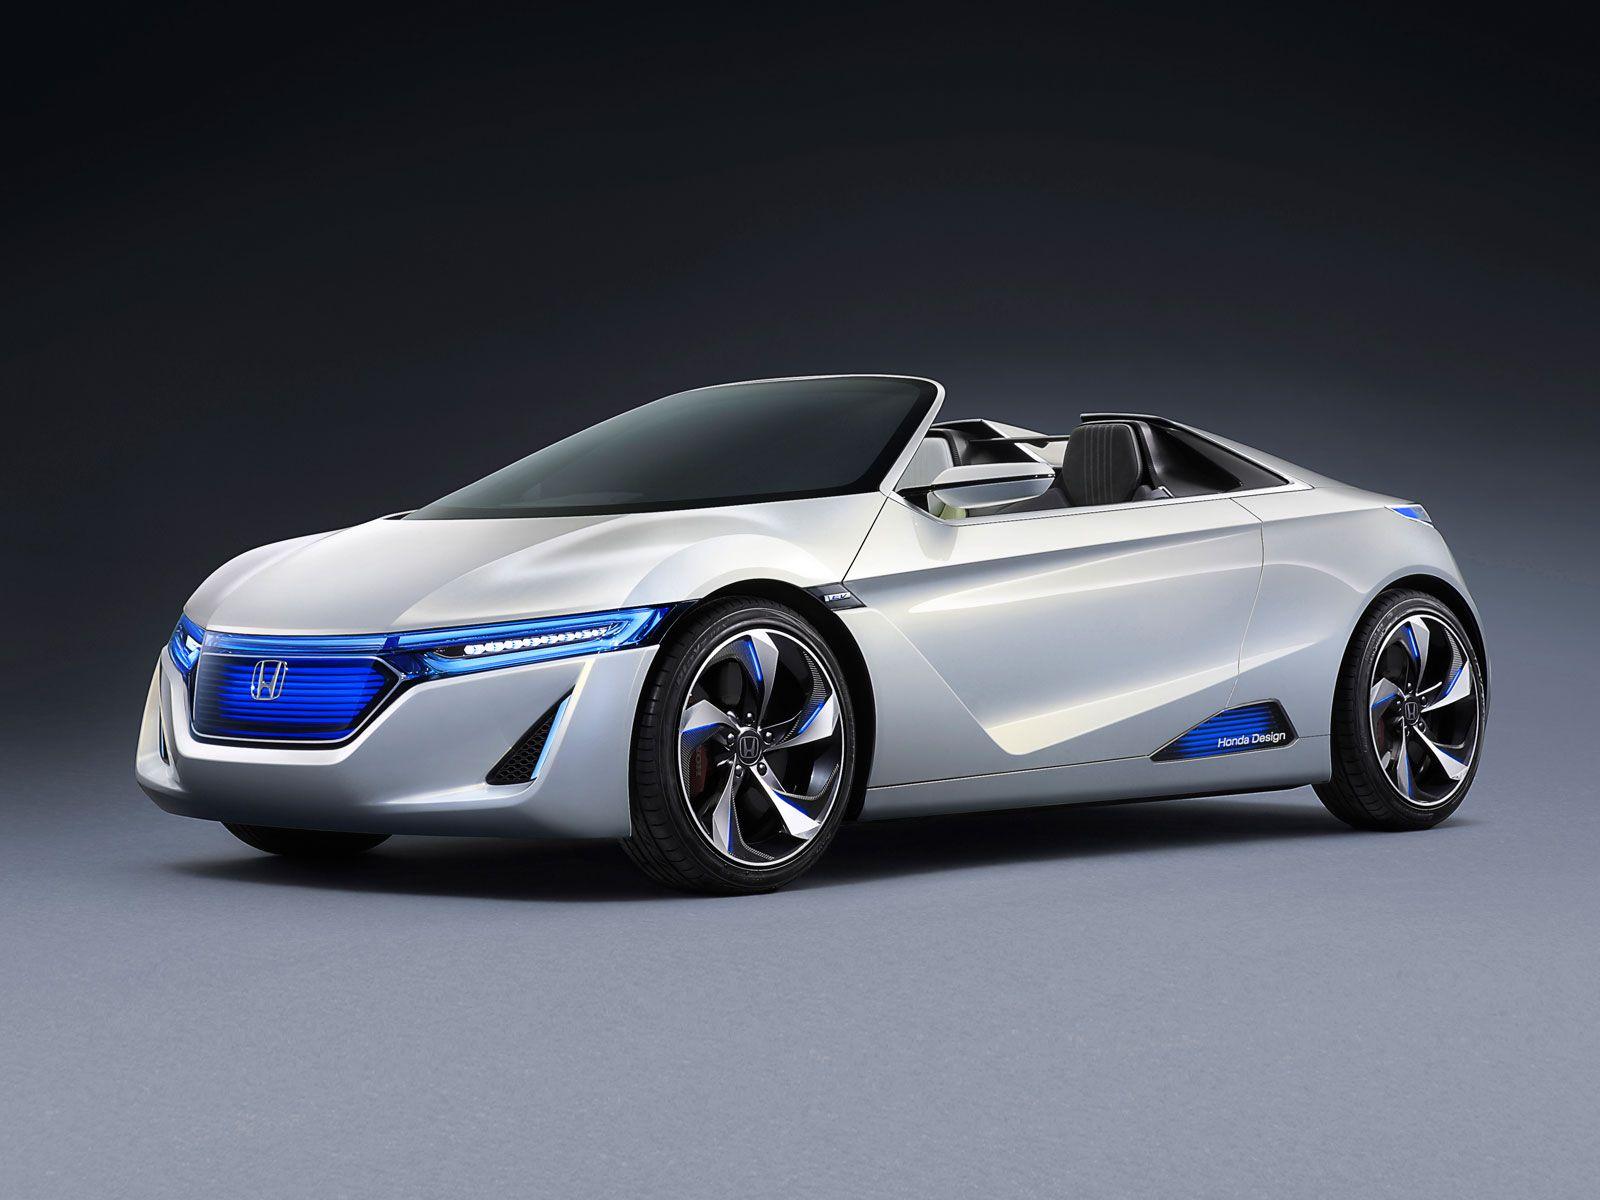 Honda Convertibles New Car | New Honda Convertible Sports Car Being  Developed!